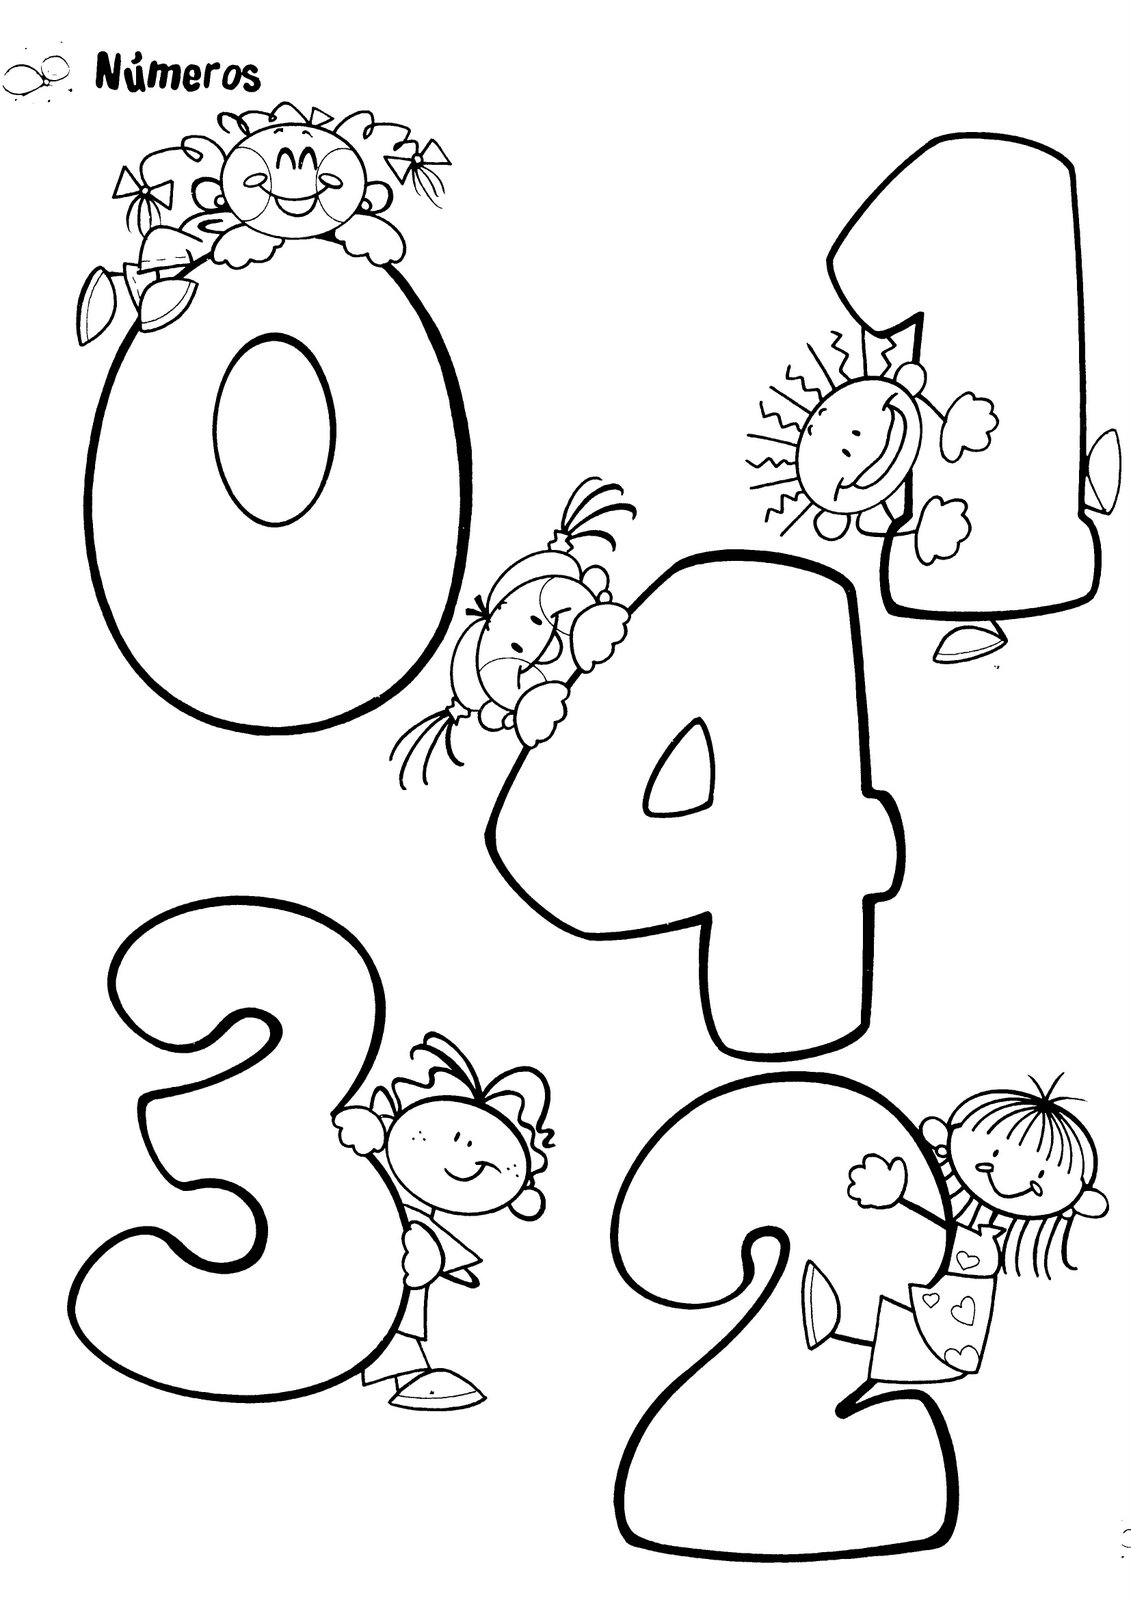 Dibujos Para Caratulas De Matematica Imagui